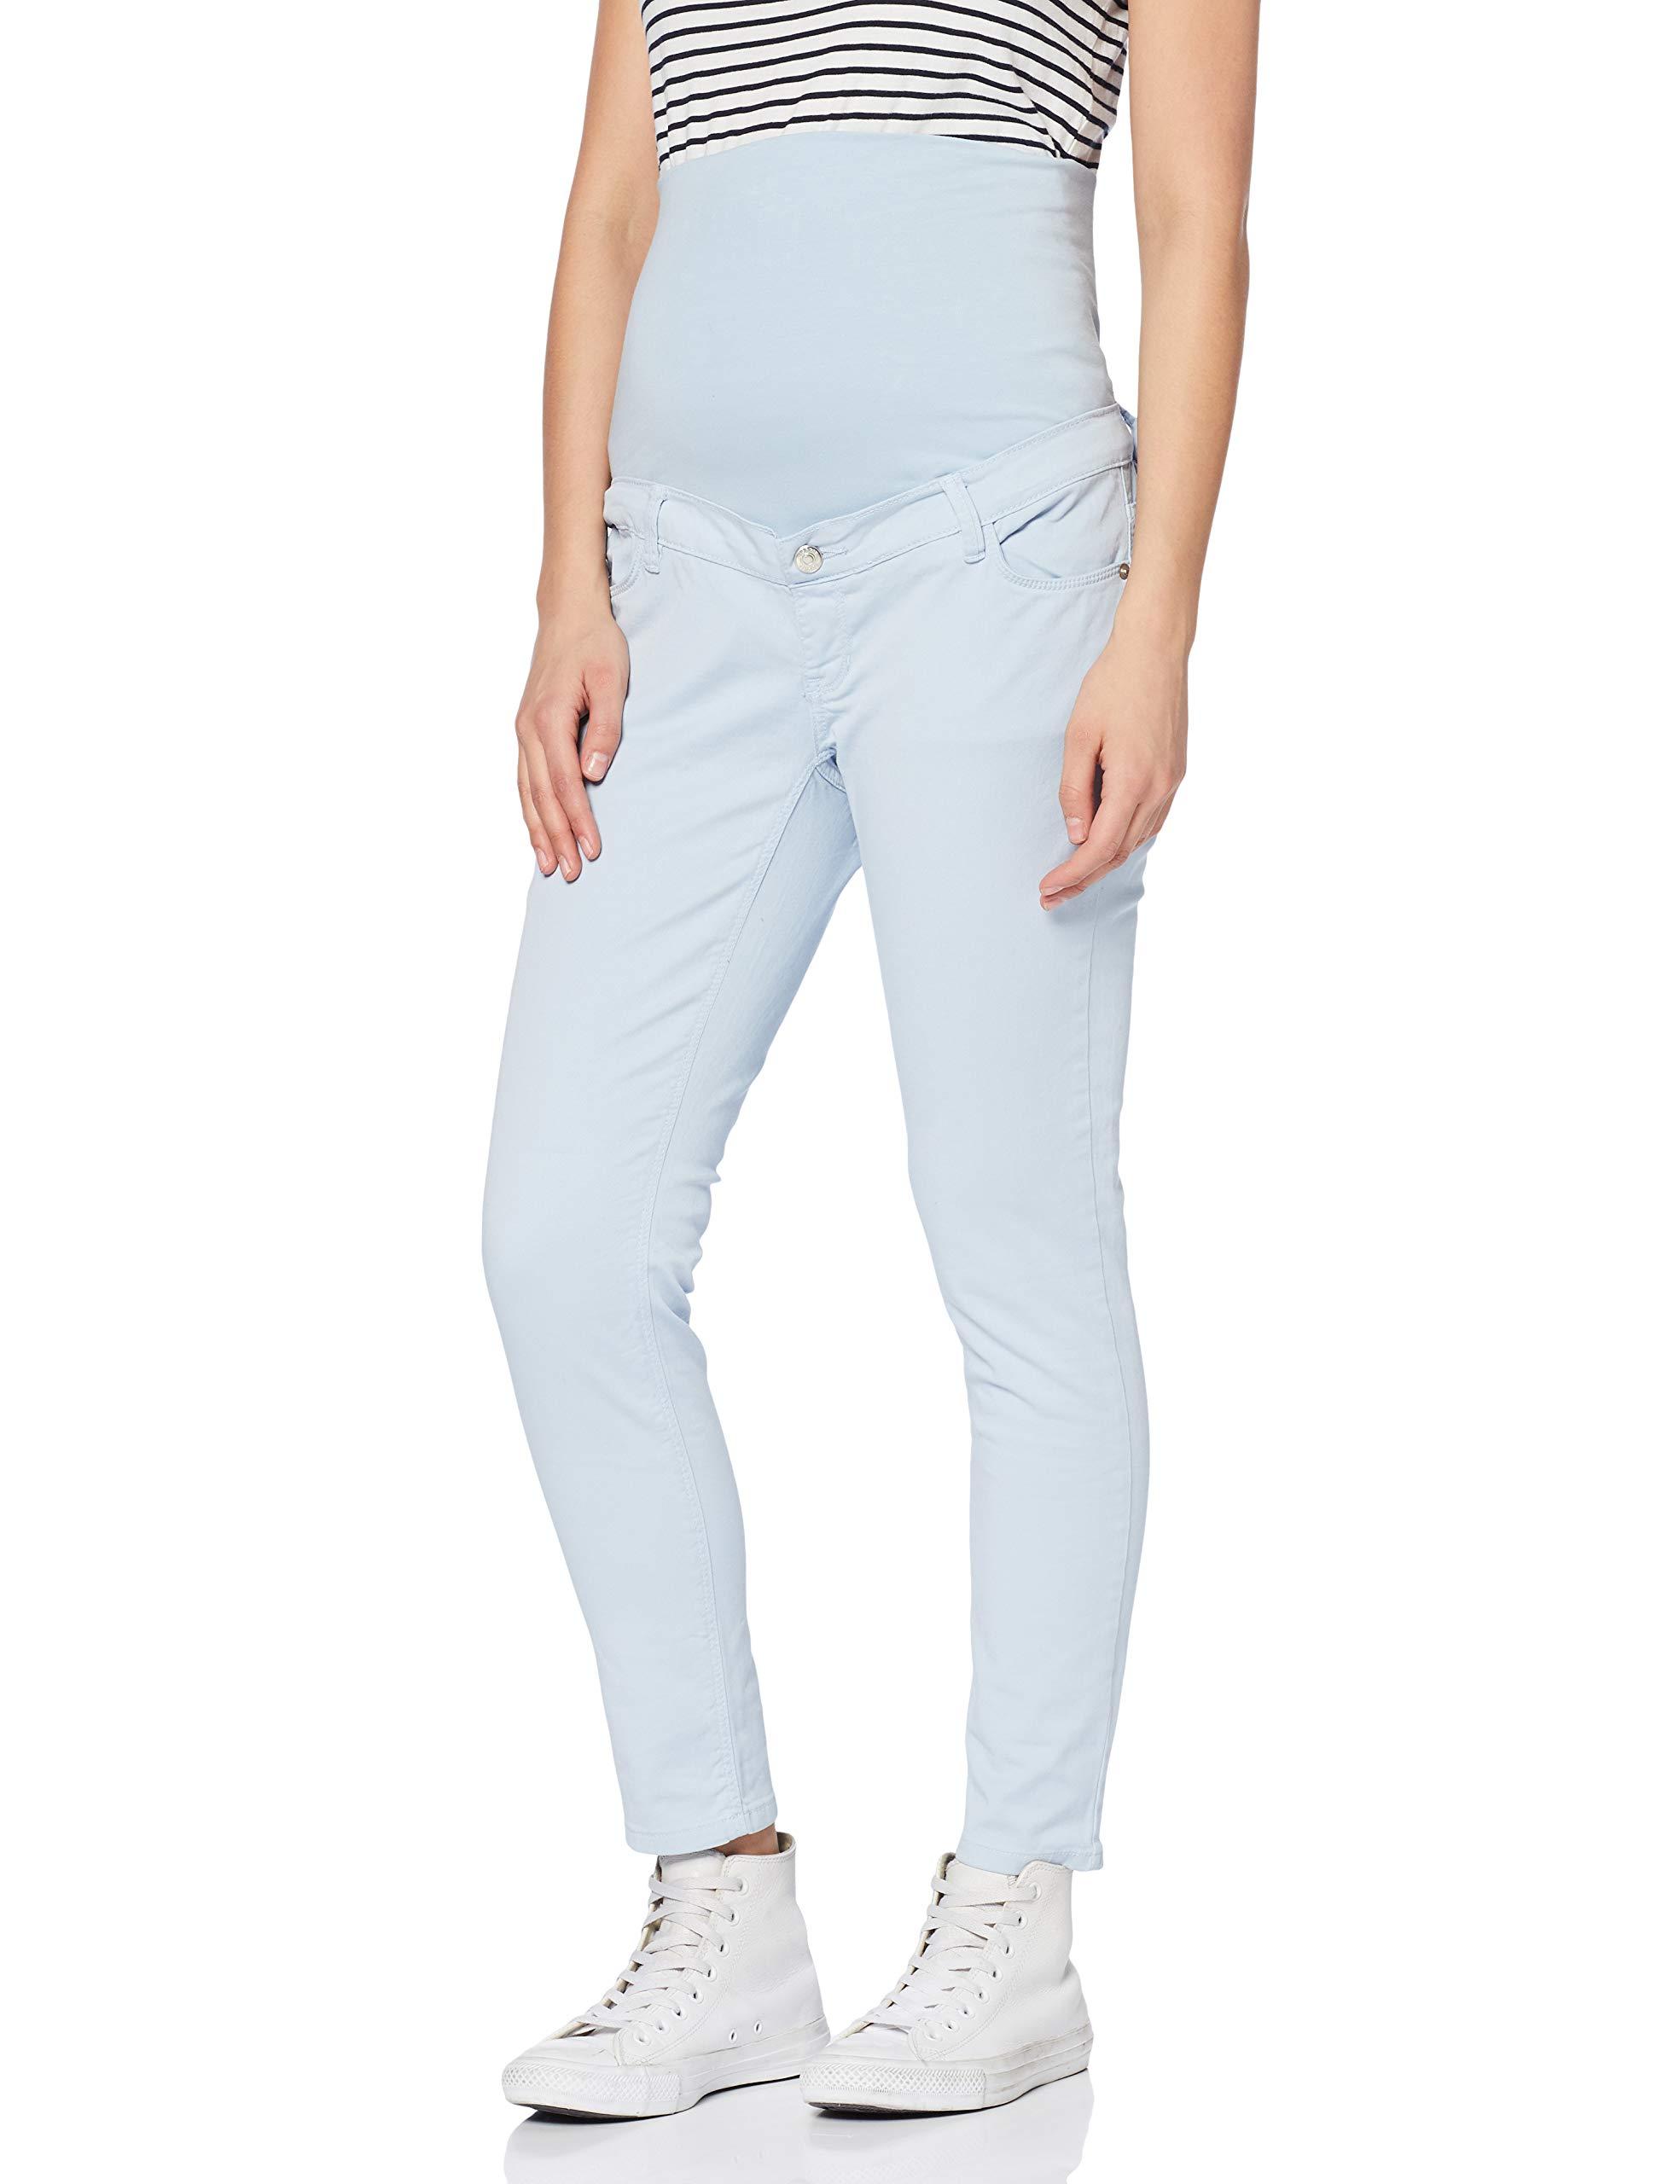 Slim Maternity Pants FemmeBleulight 8PantalonsMaternité Capri Fabricant44 Otb Esprit Blue 44046taille 7 QxhdtsrC